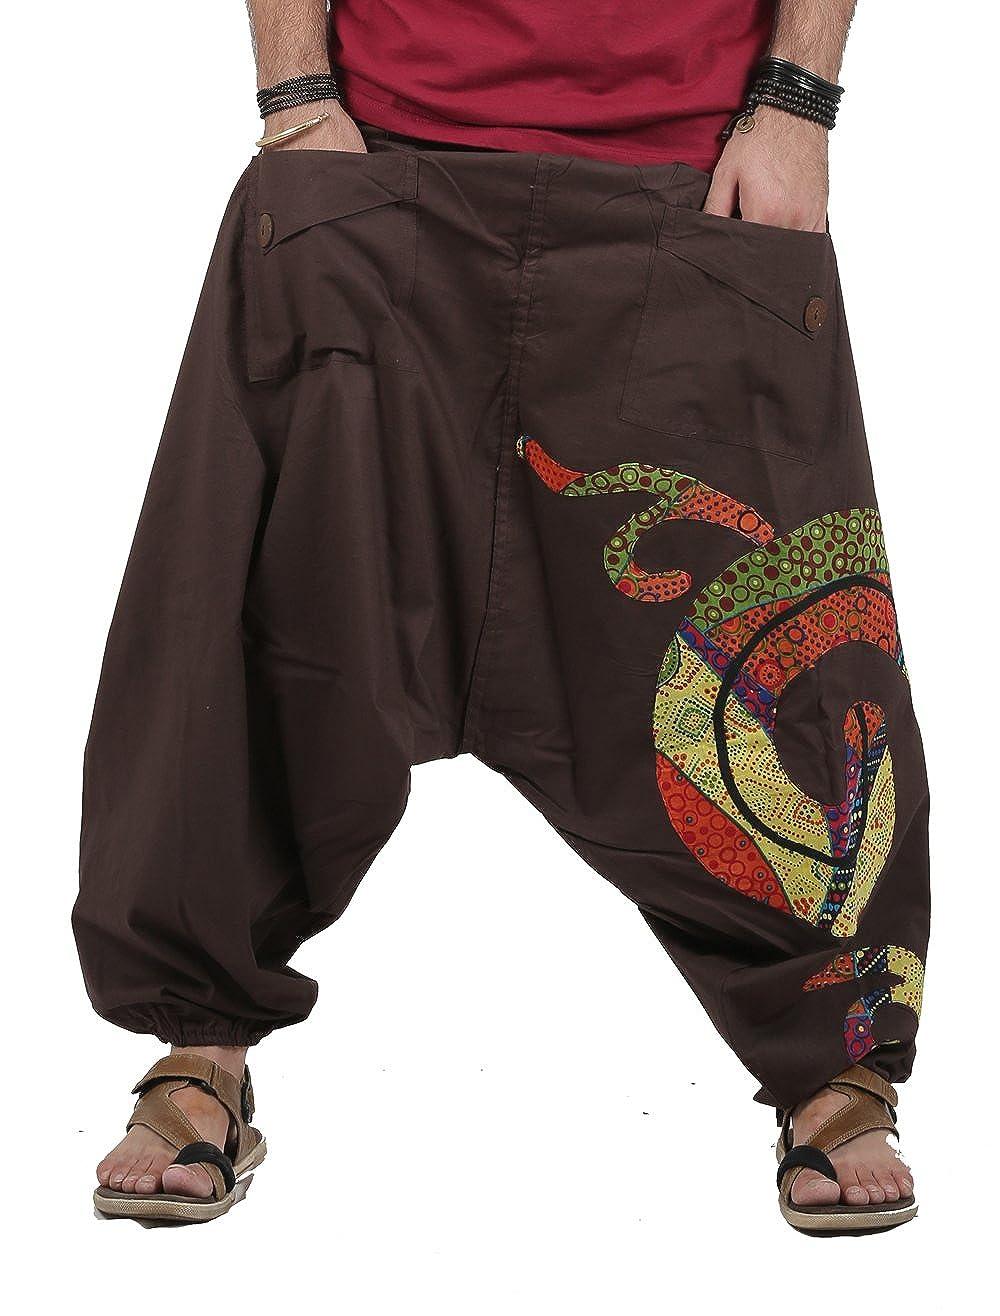 The Harem Studio Hombre Mujer Pantalones Harem Unisex Bombachos Ligeros, Hippies, de algodón, Casuales, Boho - Estilo Patchwork